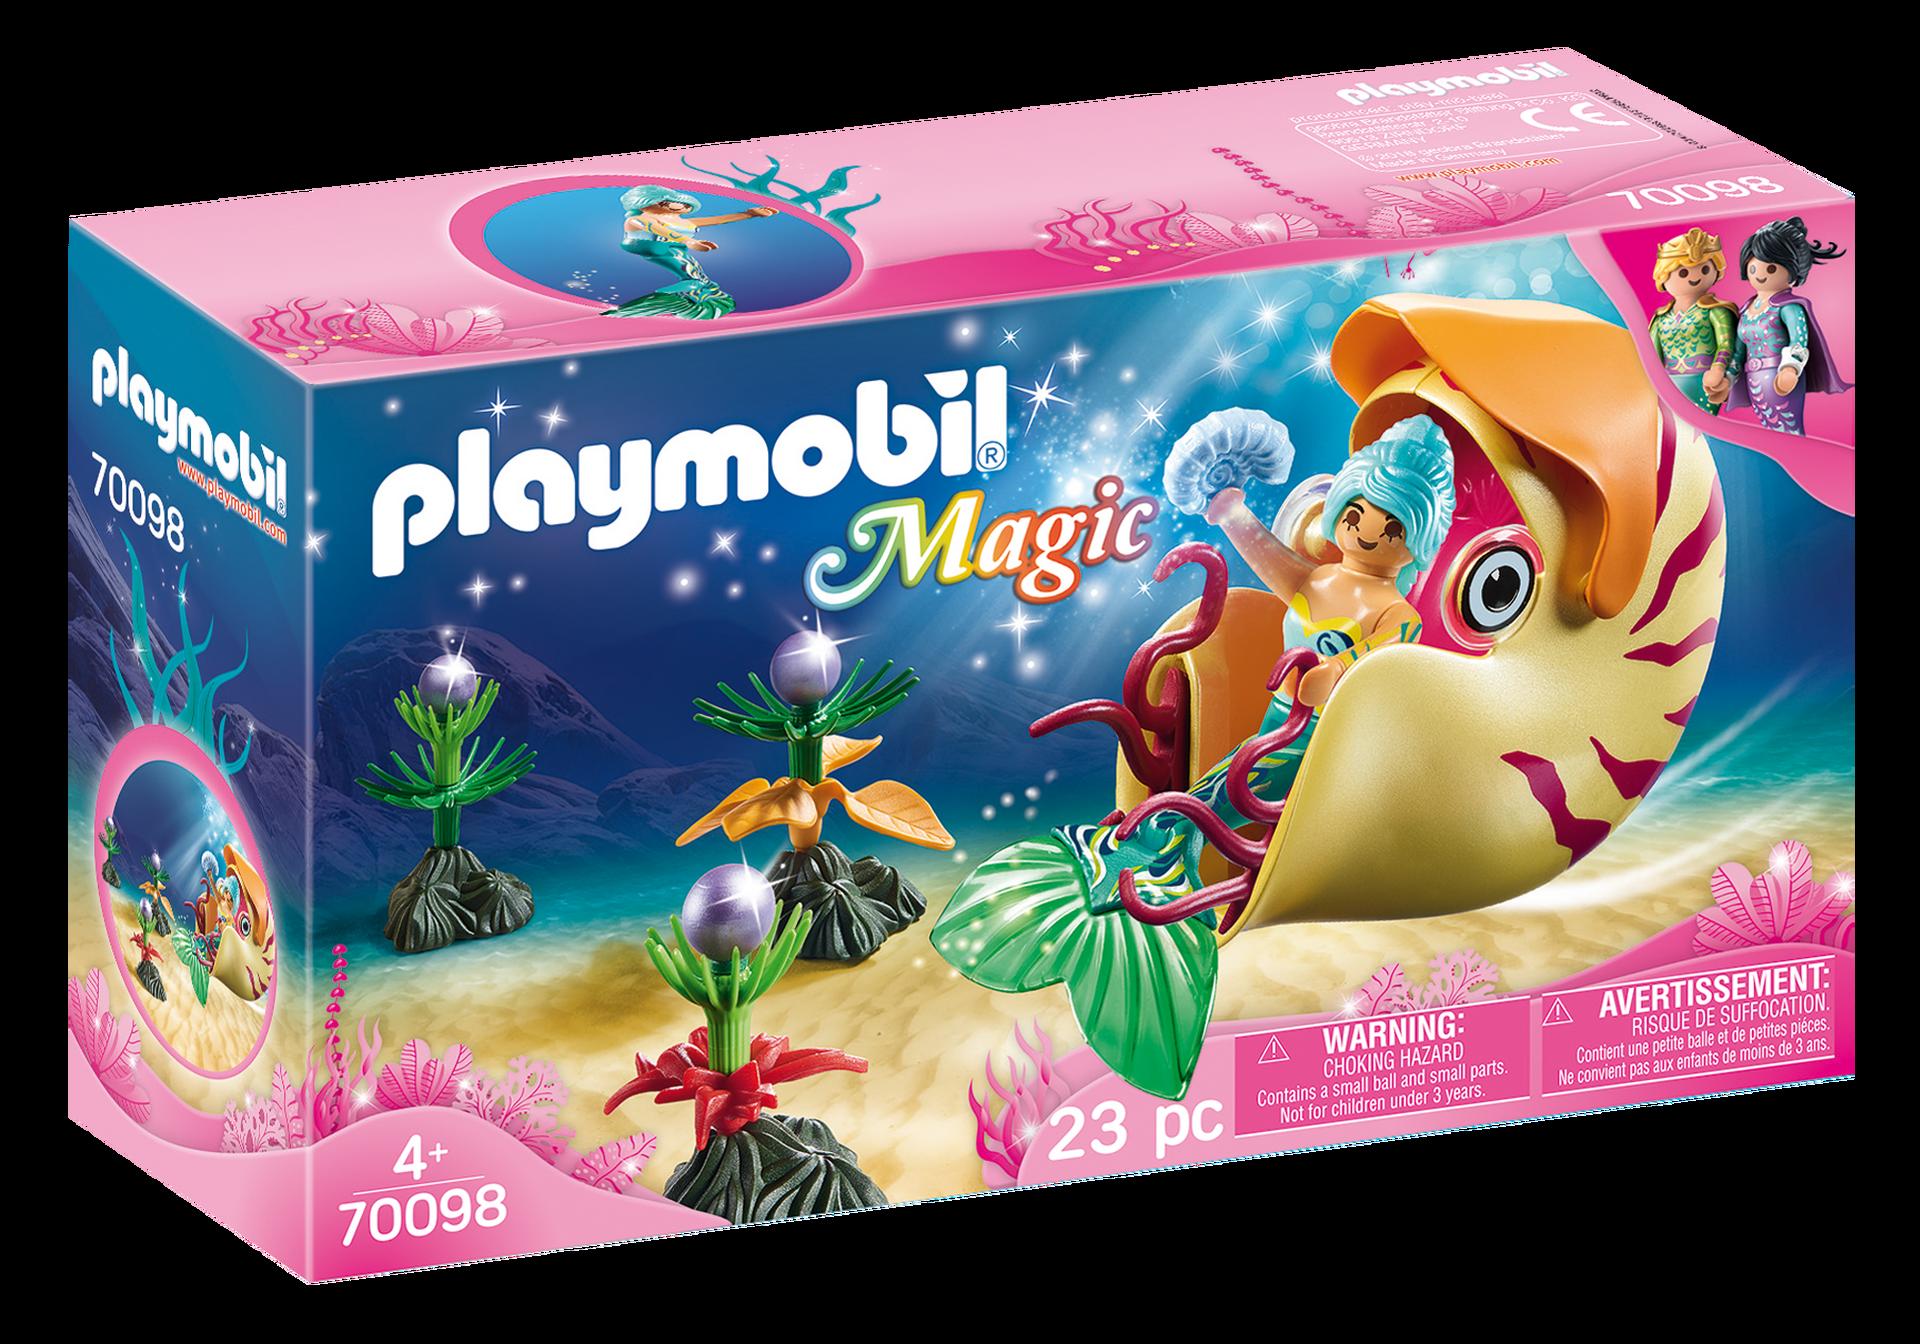 Playmobil - Magic - Nautilus Gondola (70098)